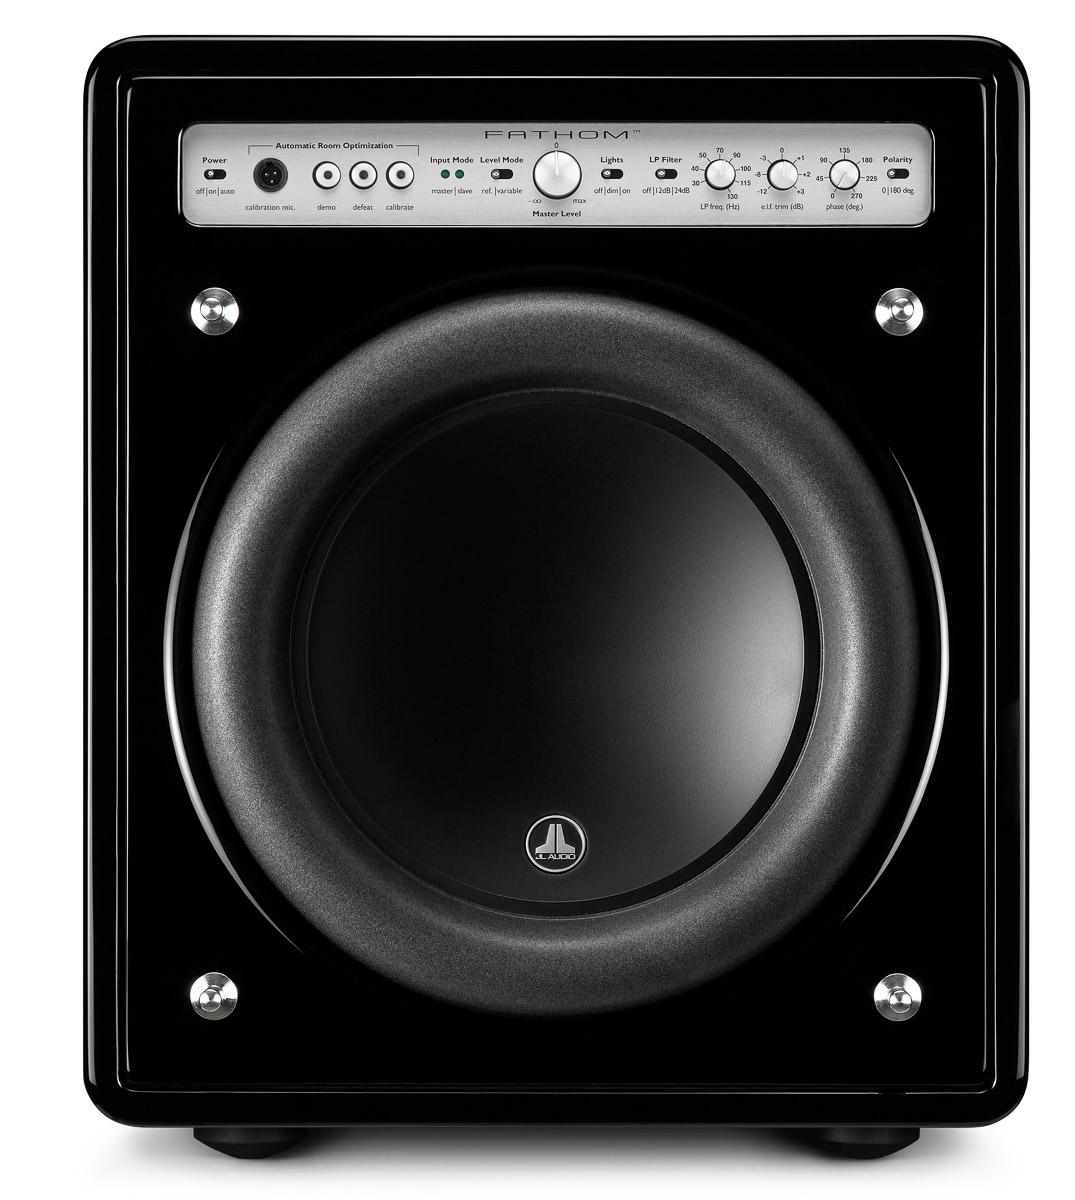 small resolution of jl audio fathom f110v2 gloss fathom v2 wiring diagram furthermore jl audio w7 ho box likewise jl audio w7